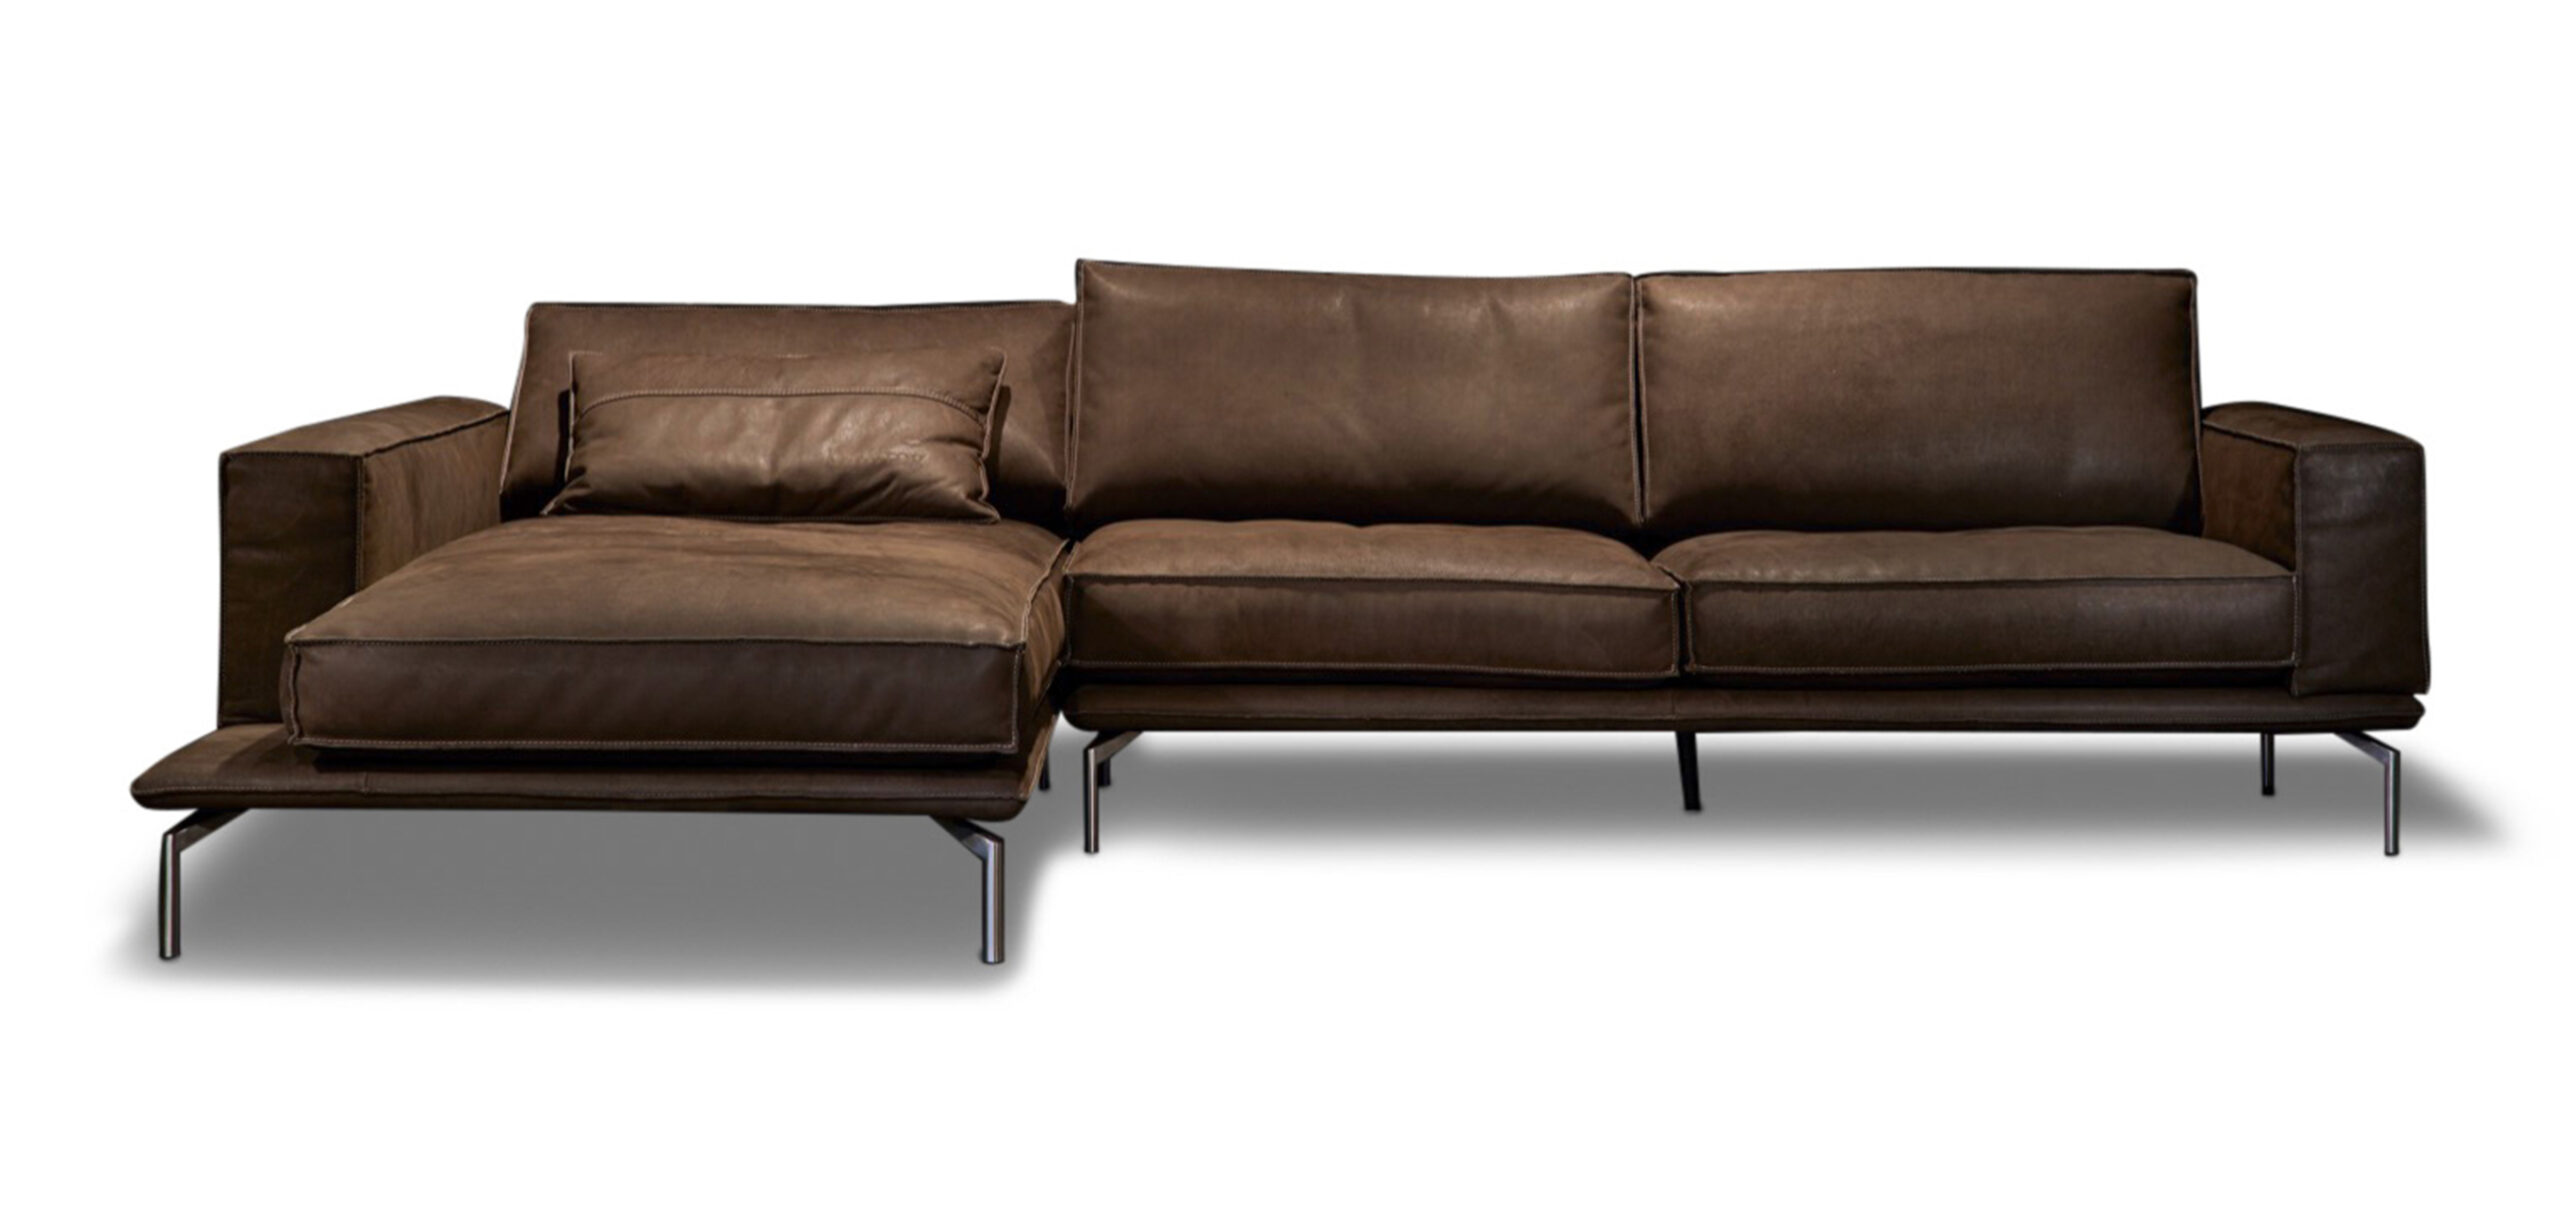 Full Size of Bullfrog Lulu Preis Sofa Design Funktional Chic Jenversode Wohnzimmer Bullfrog Lulu